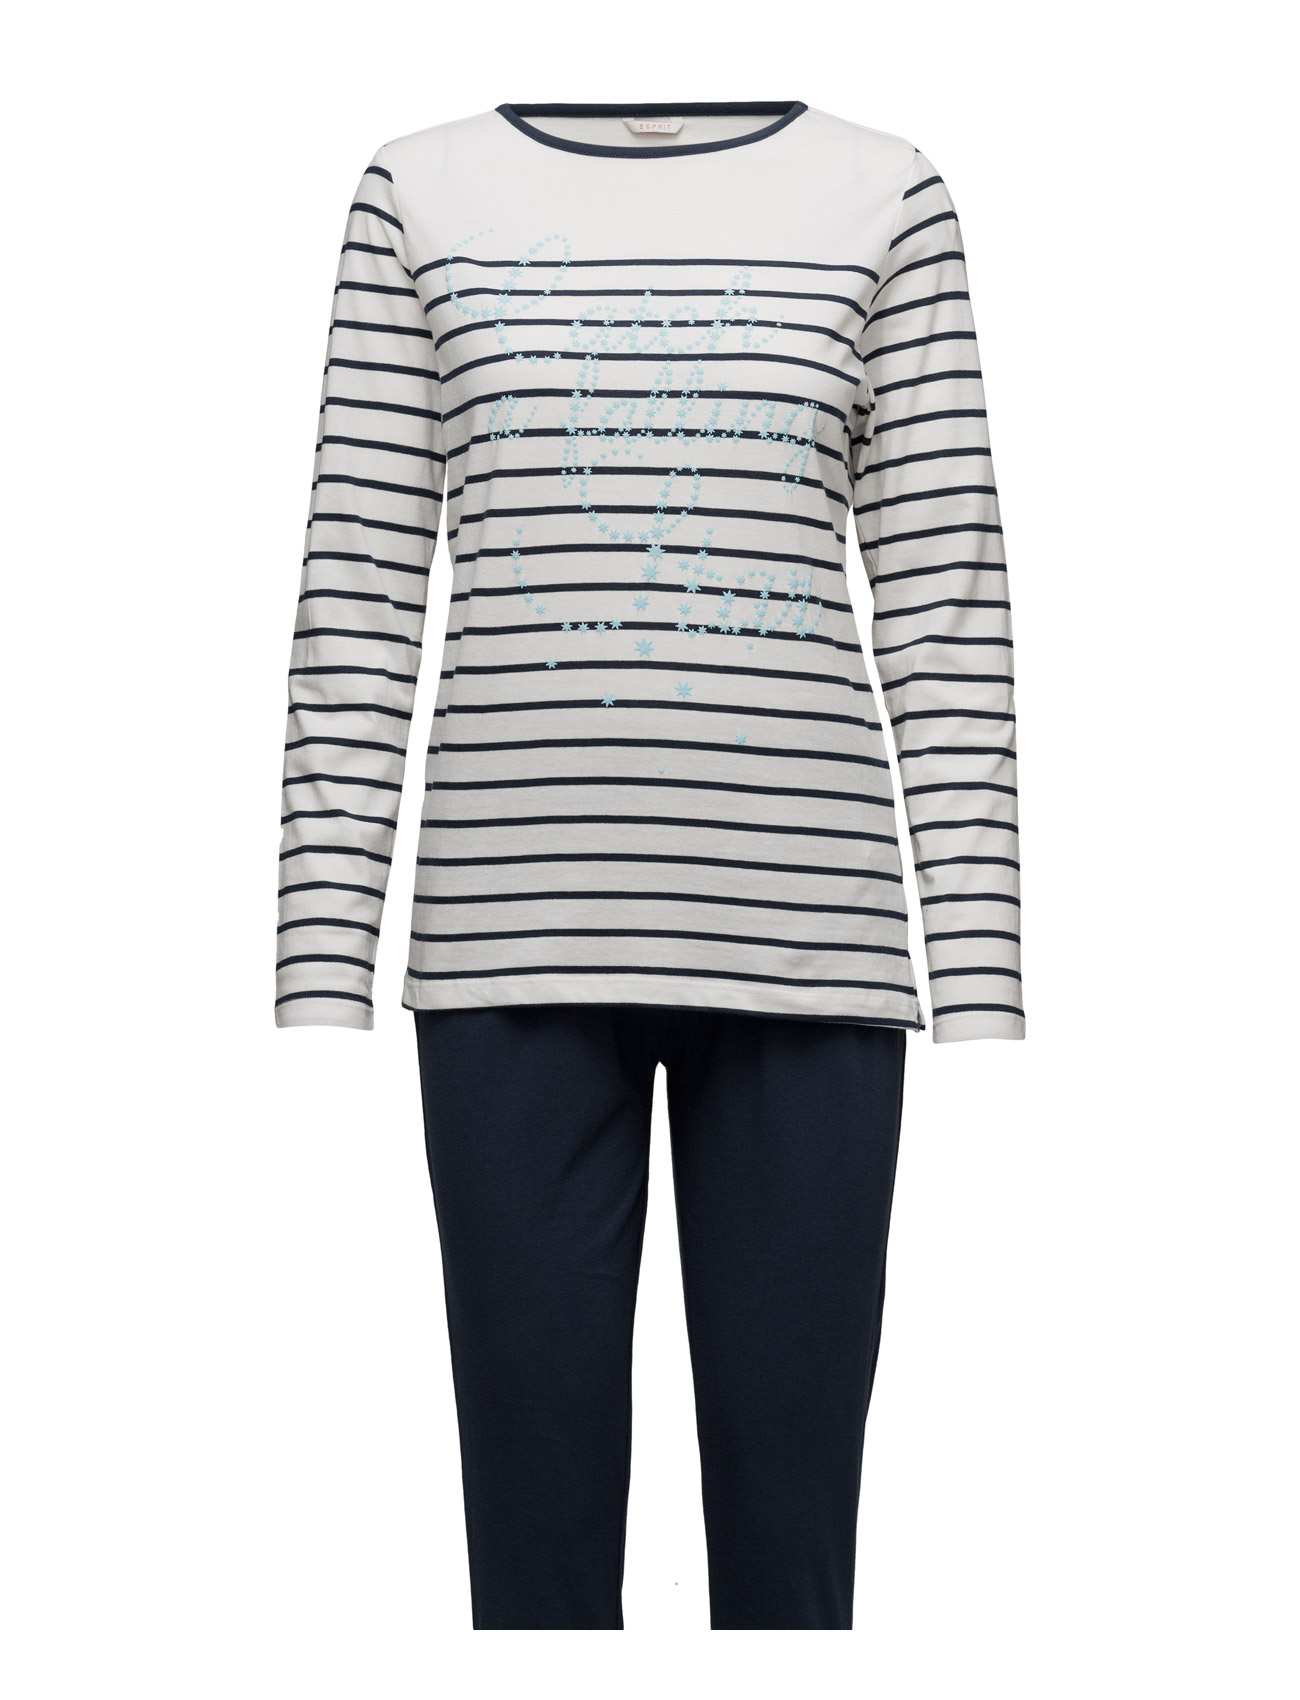 Pyjamas Esprit Bodywear Women Nattøj til Kvinder i Off White